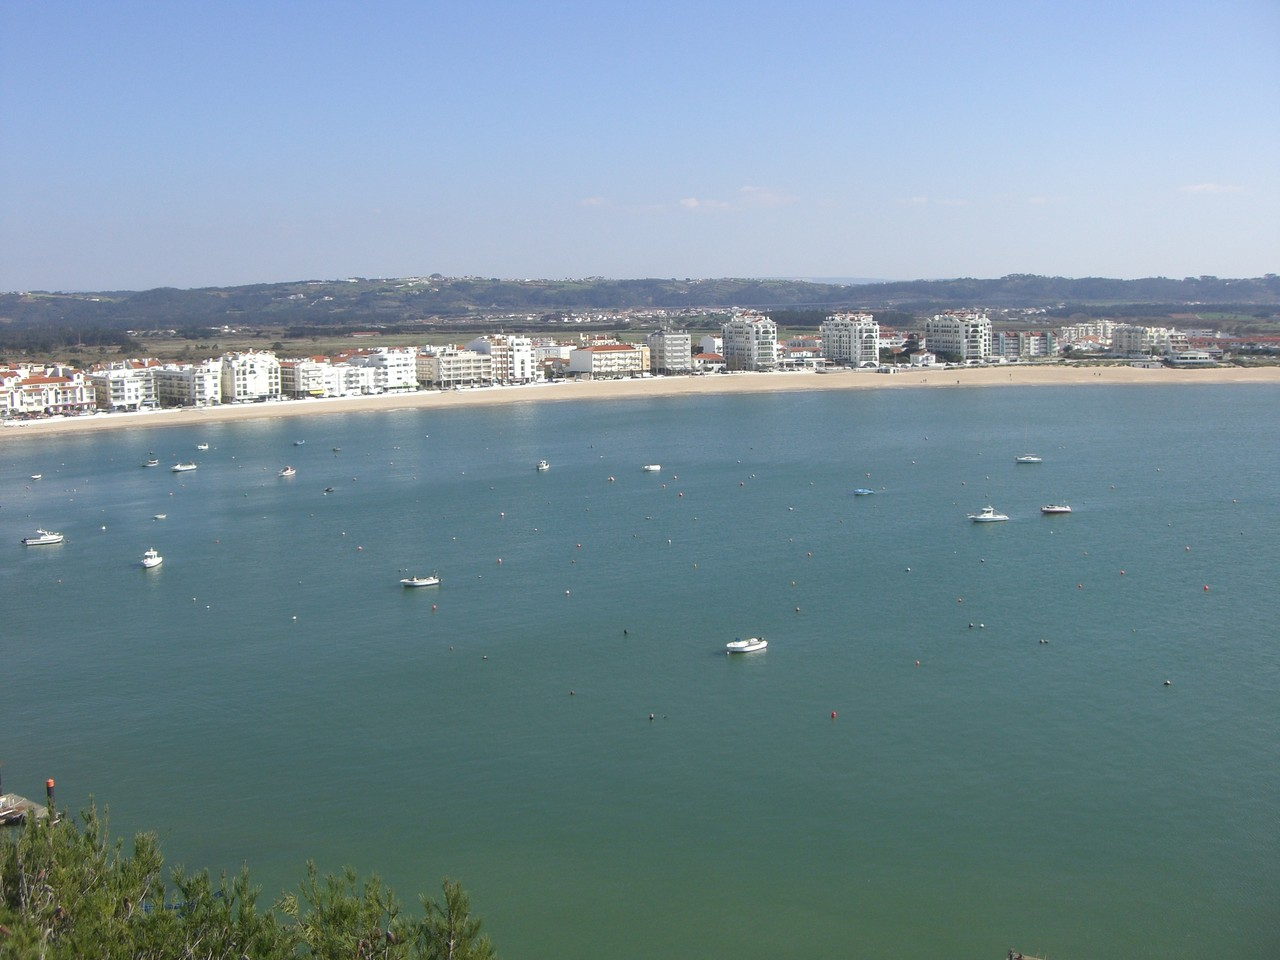 Ferienwohnung in Portugal an der Costa de Prata in Sao Martinho do Porto